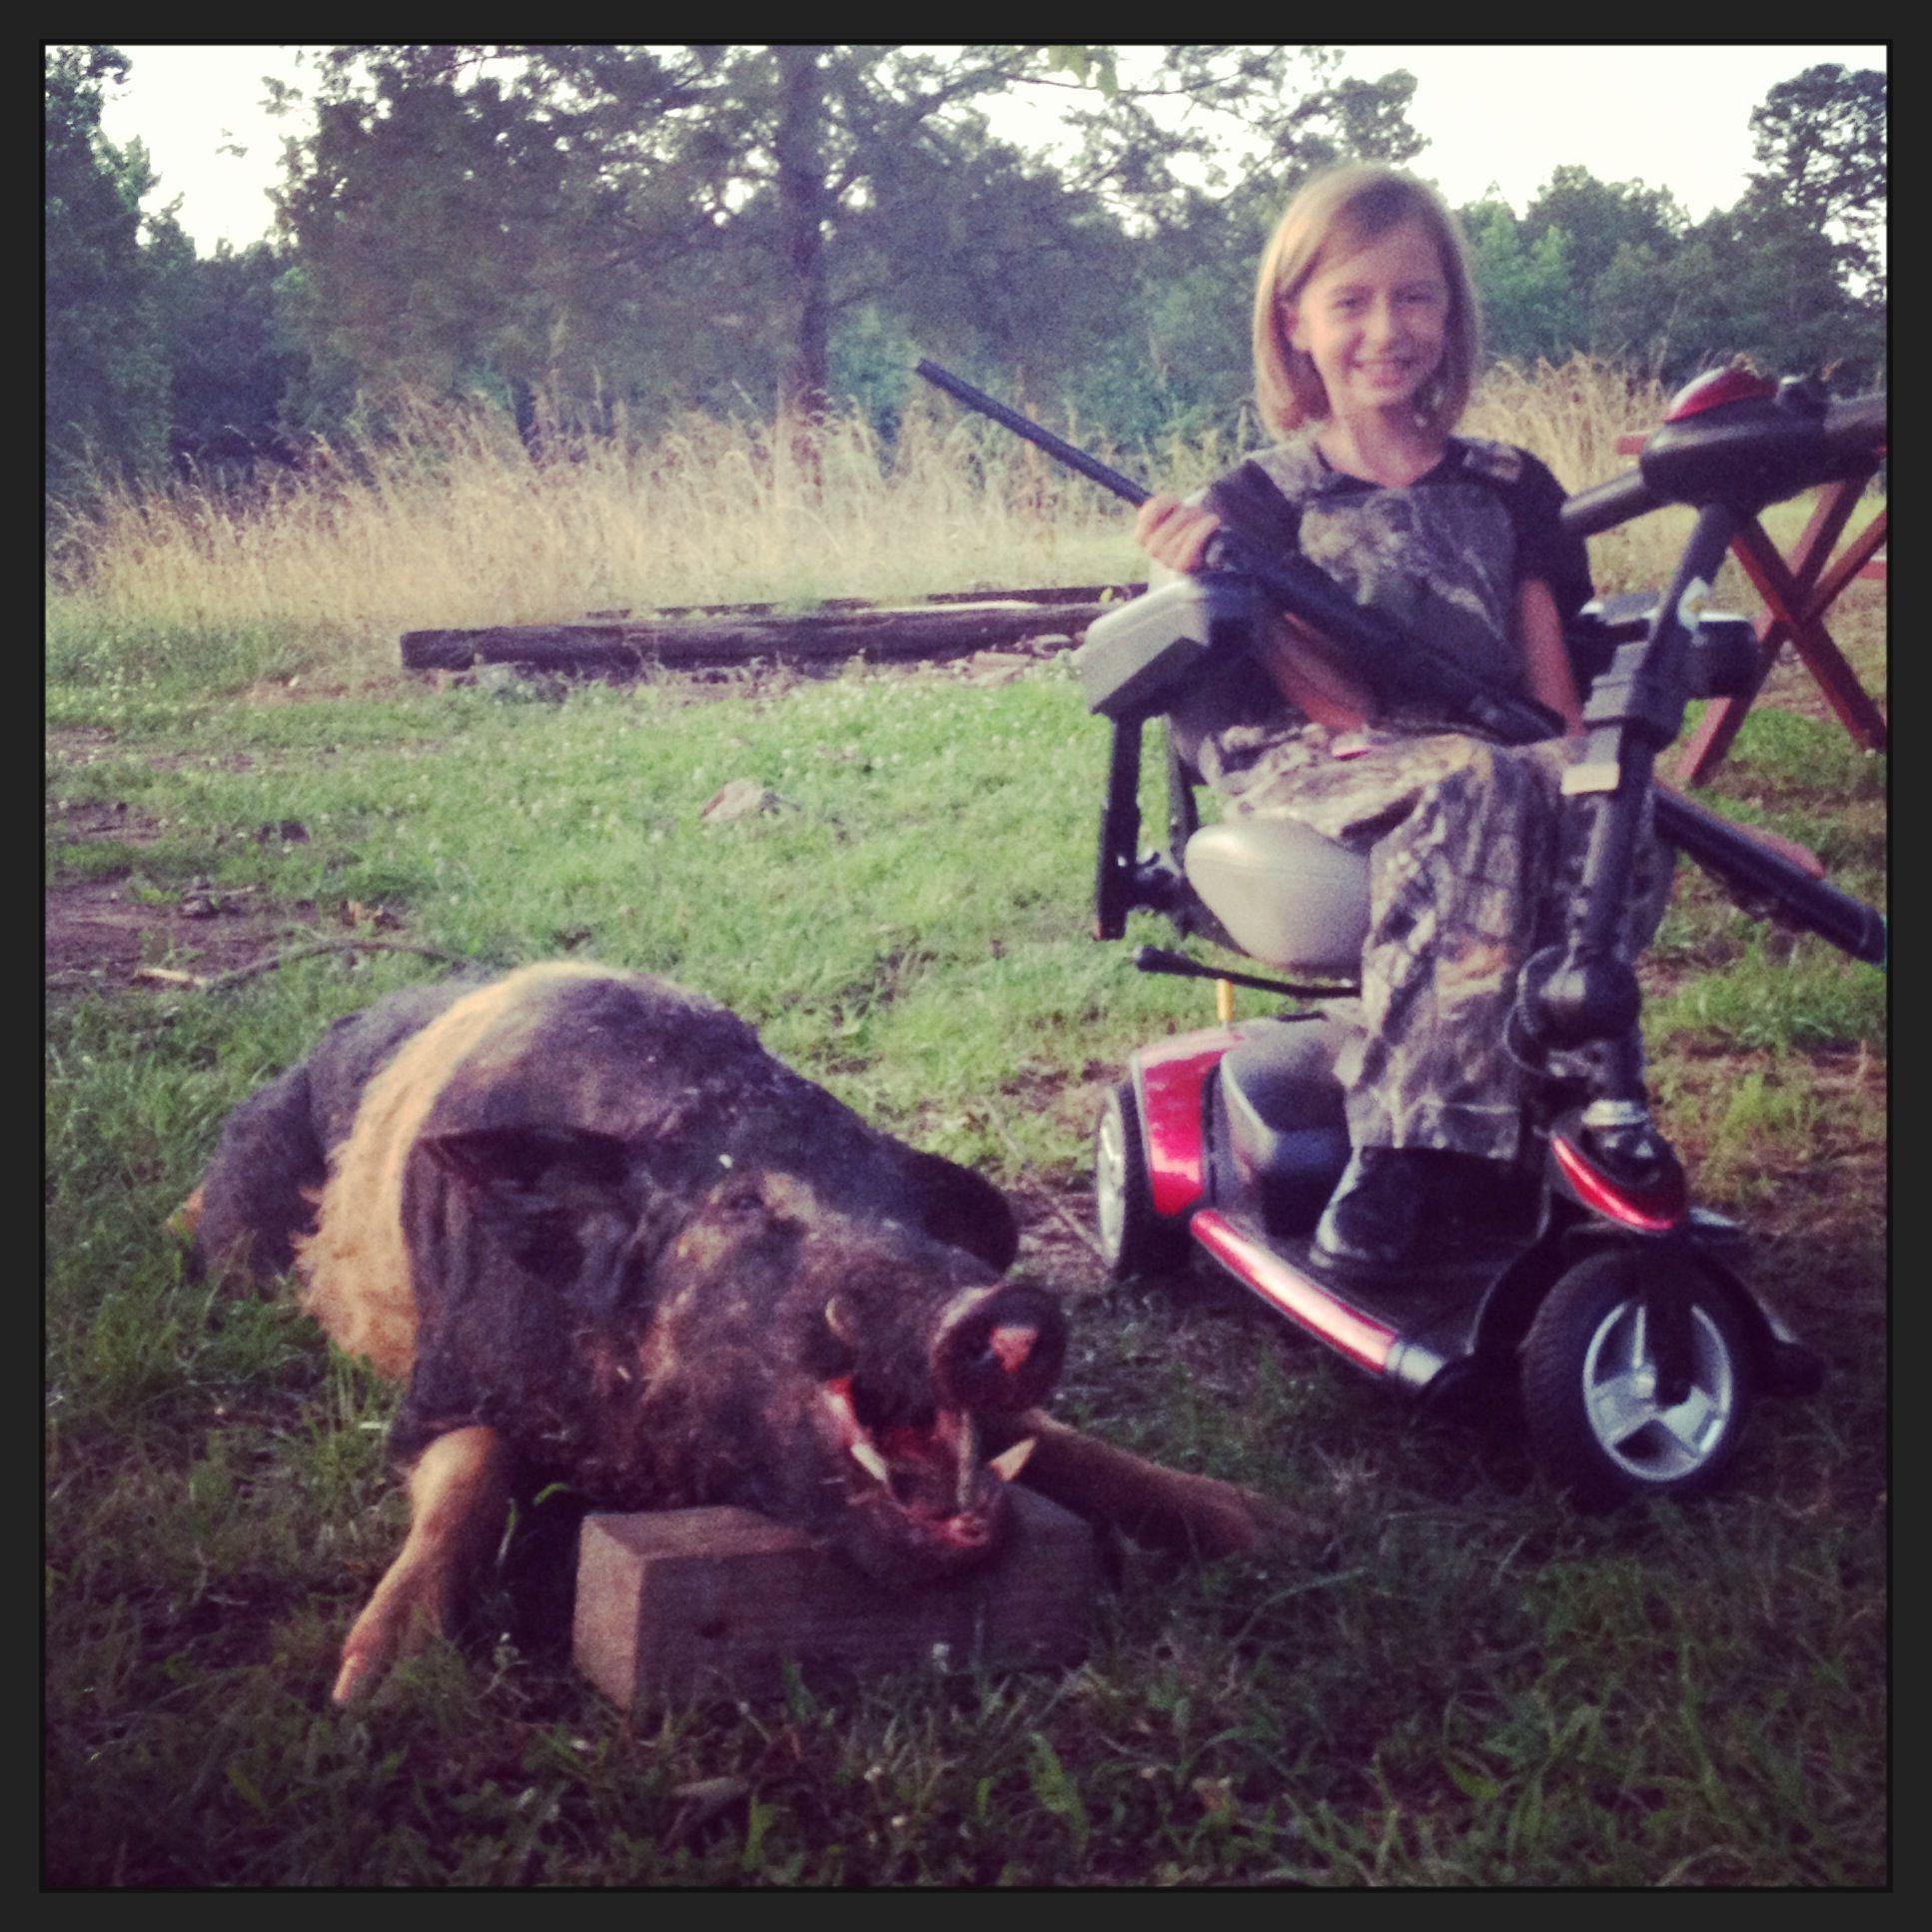 Vs Hunting Ridge Apartments: Razorback Ridge Is A Hunting Preserve With Wild Hogs That